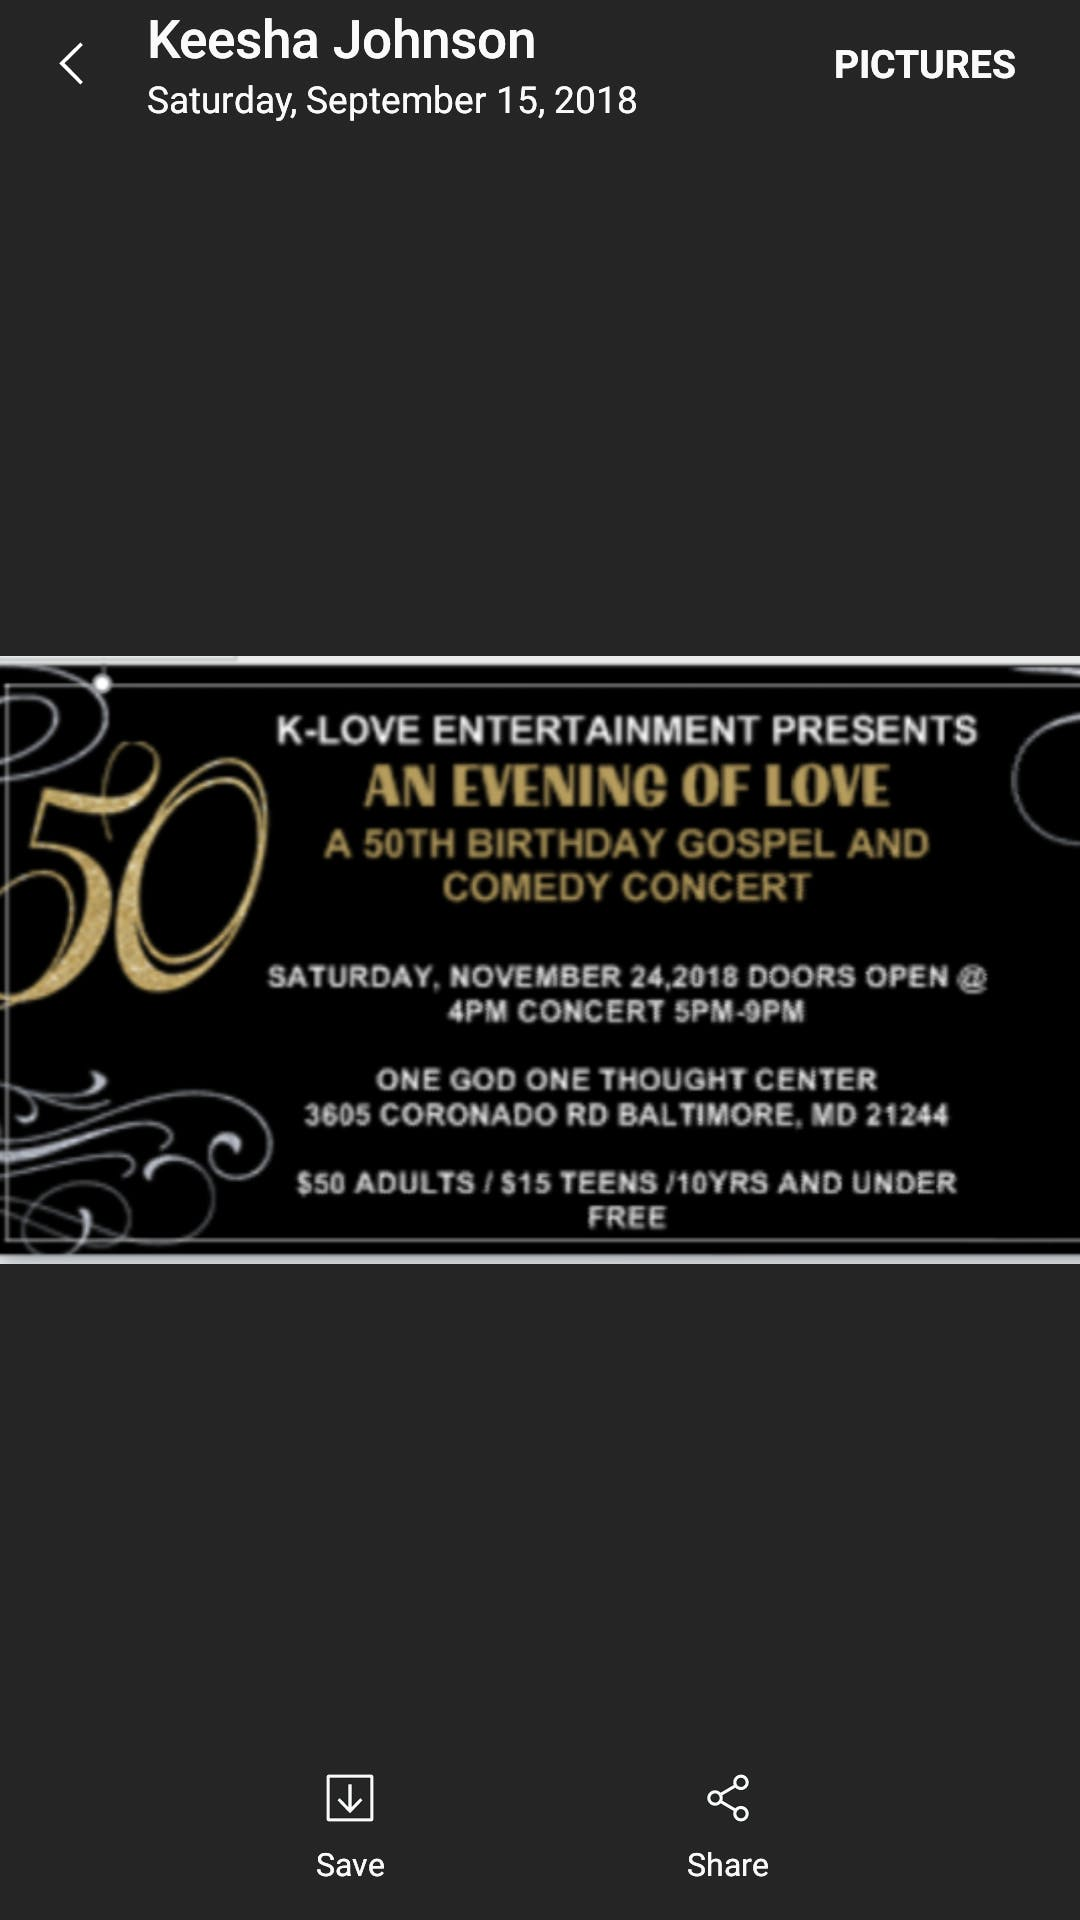 K-Love Ent. Presents `An Evening of Love` - 24 NOV 2018